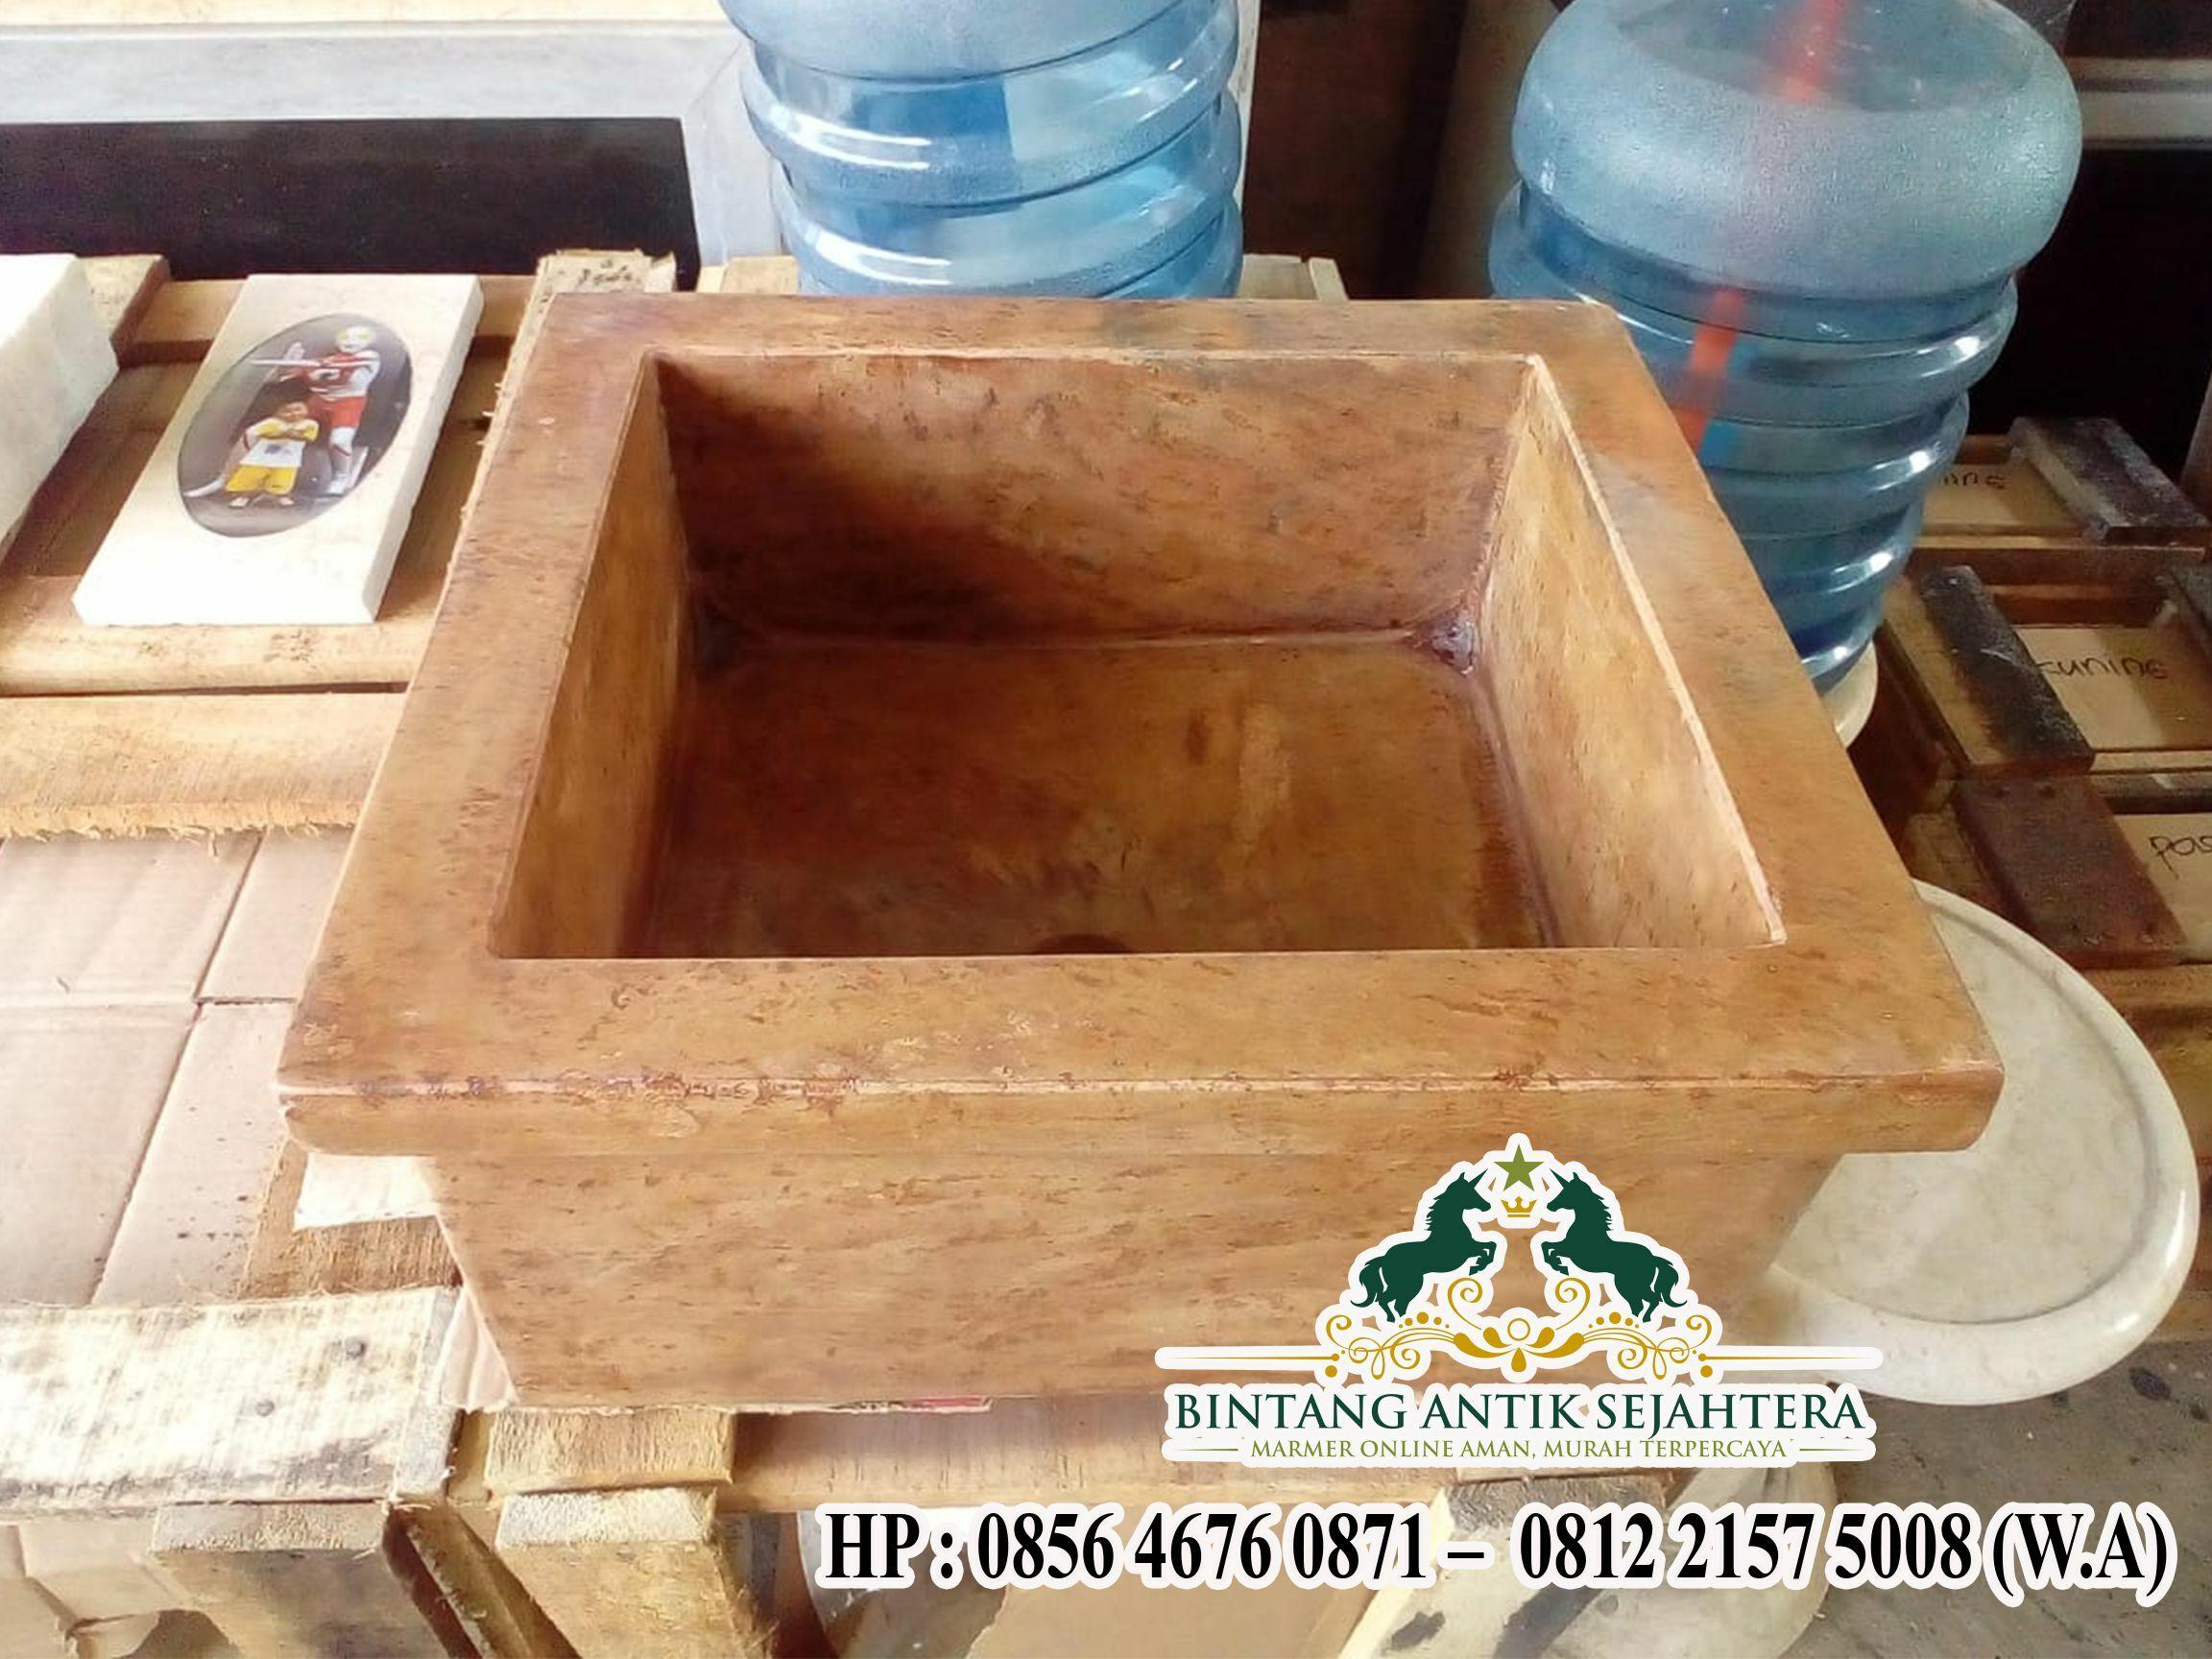 Wastafel Kotak Marmer | Jual Wastafel Onyx